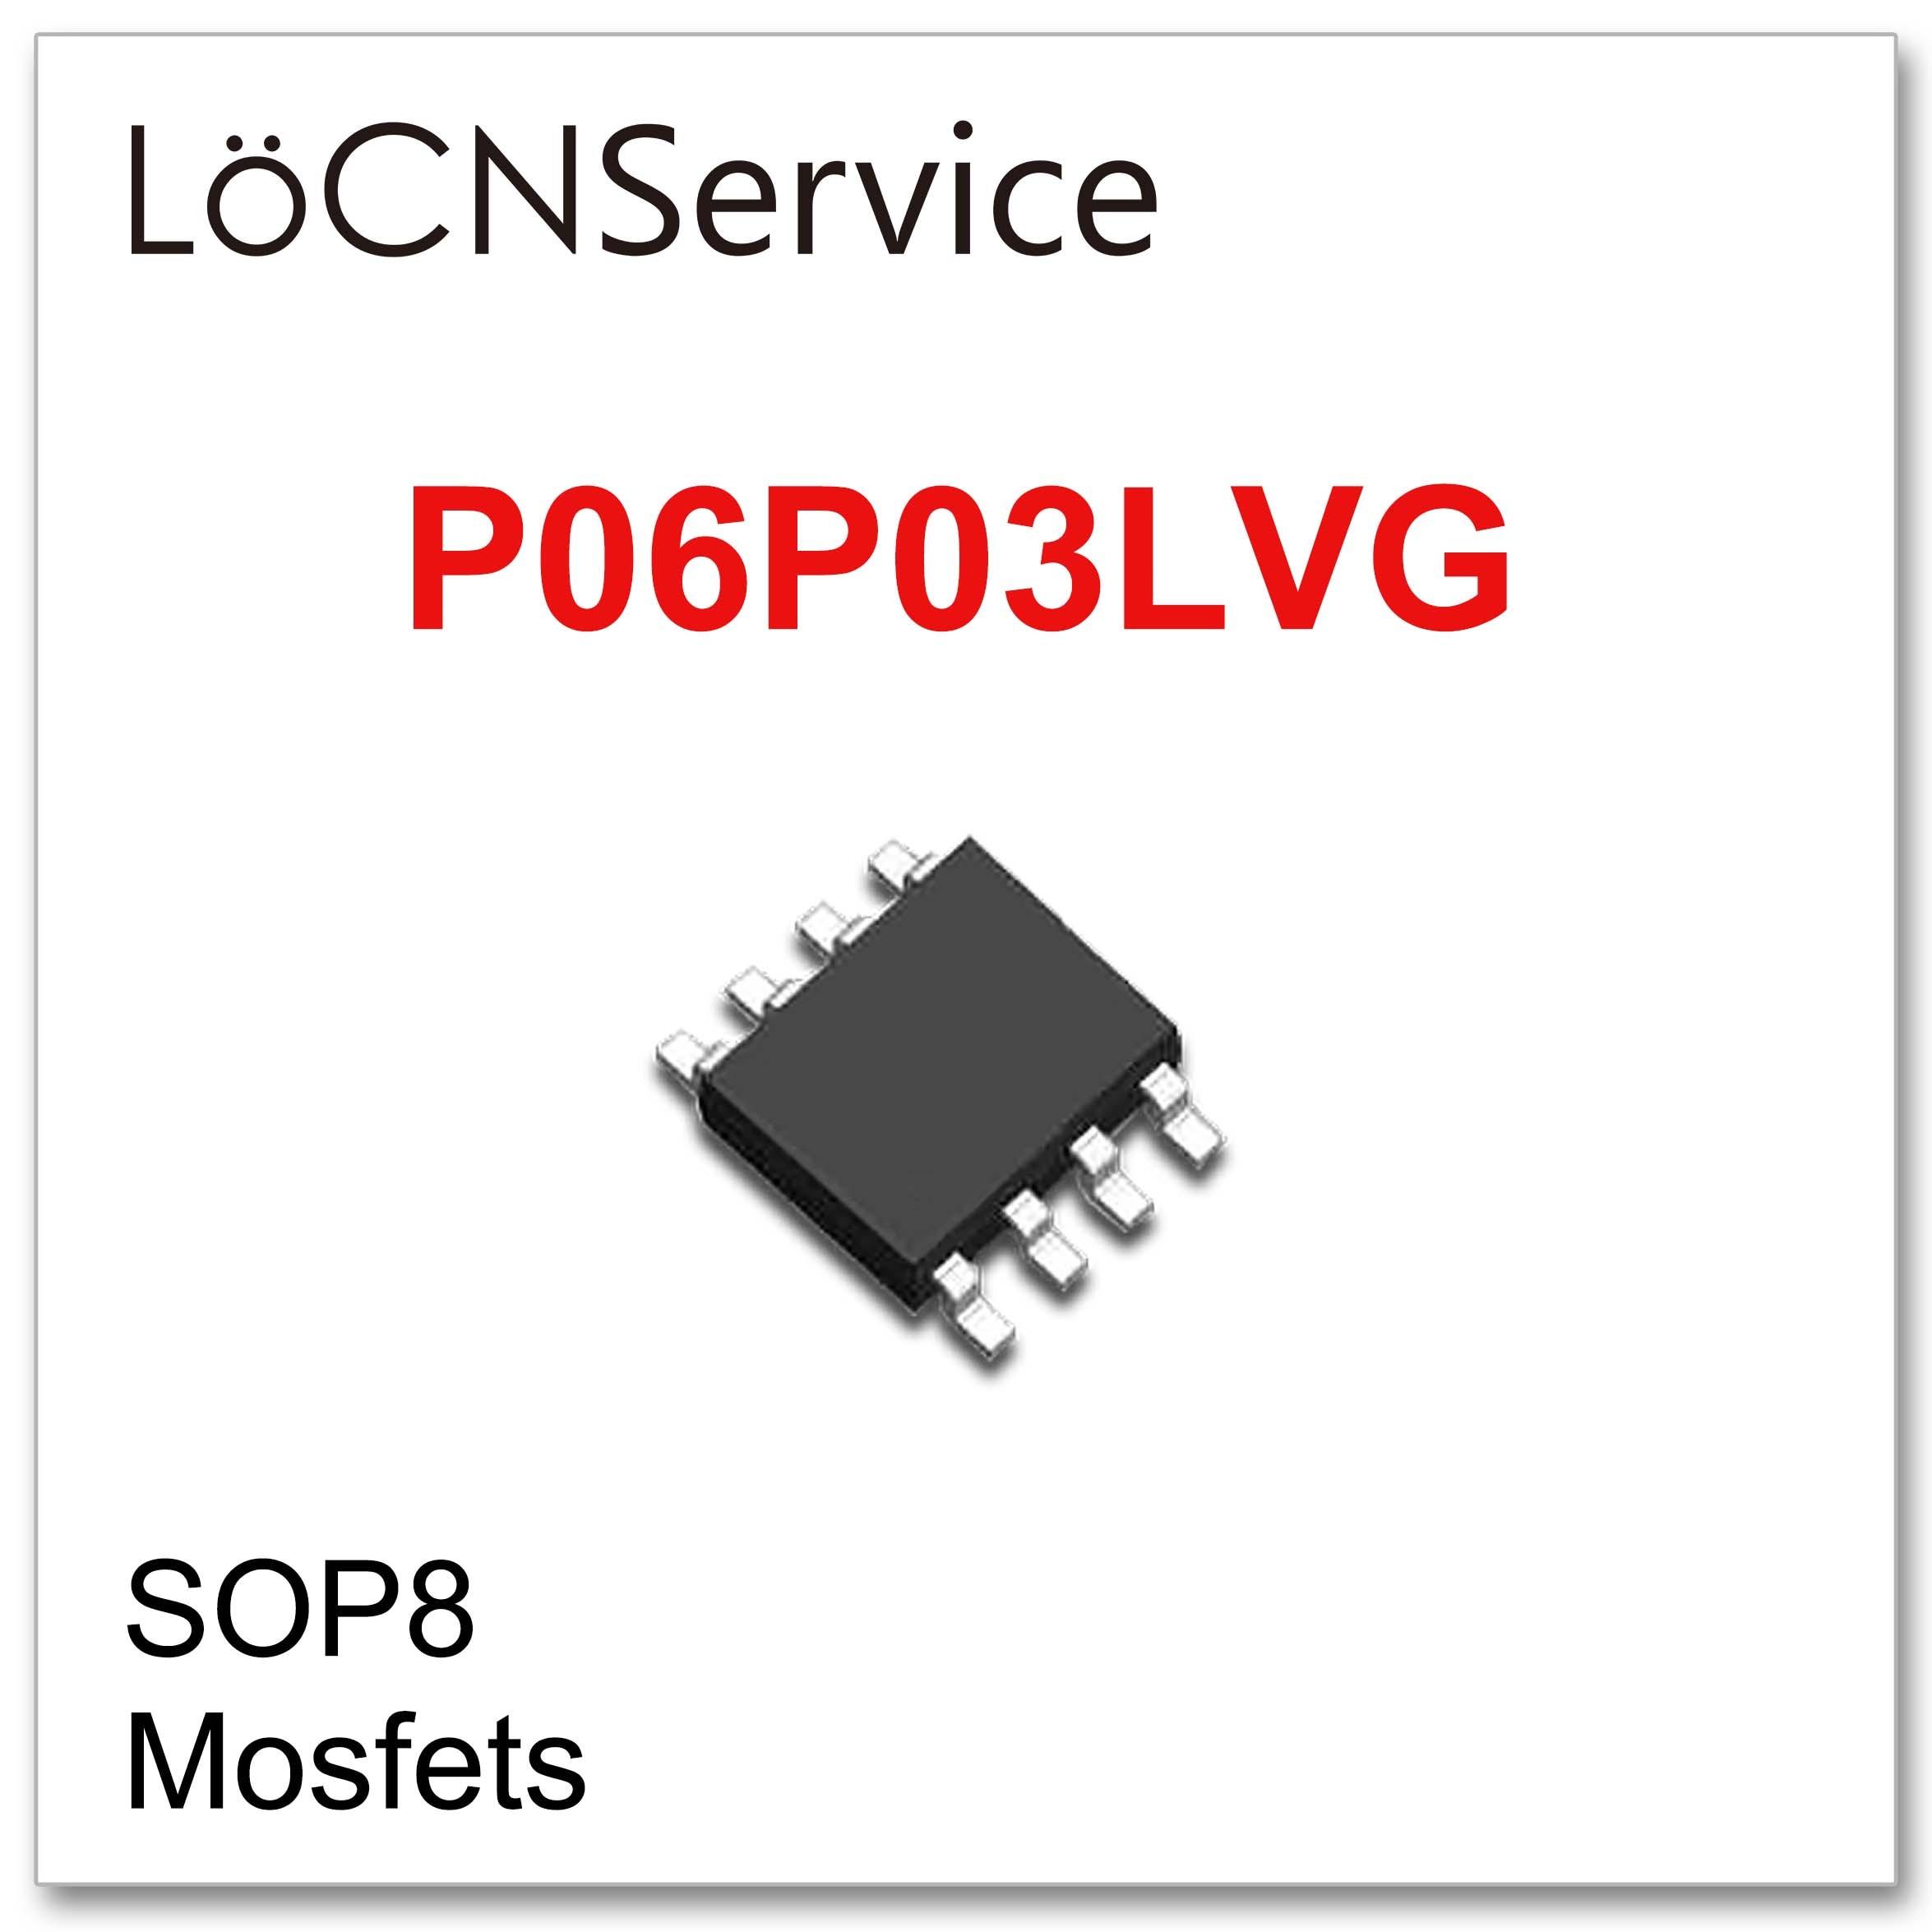 Locnservice 50 pces 500 pces sop8 p06p03lvg de alta qualidade